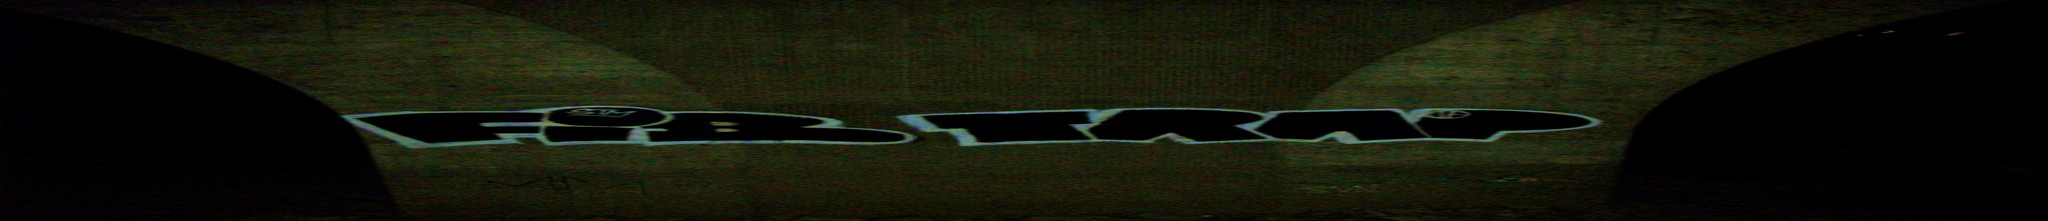 afarm9.staticflickr.com_8452_7889543636_fd014fff96_b.jpg